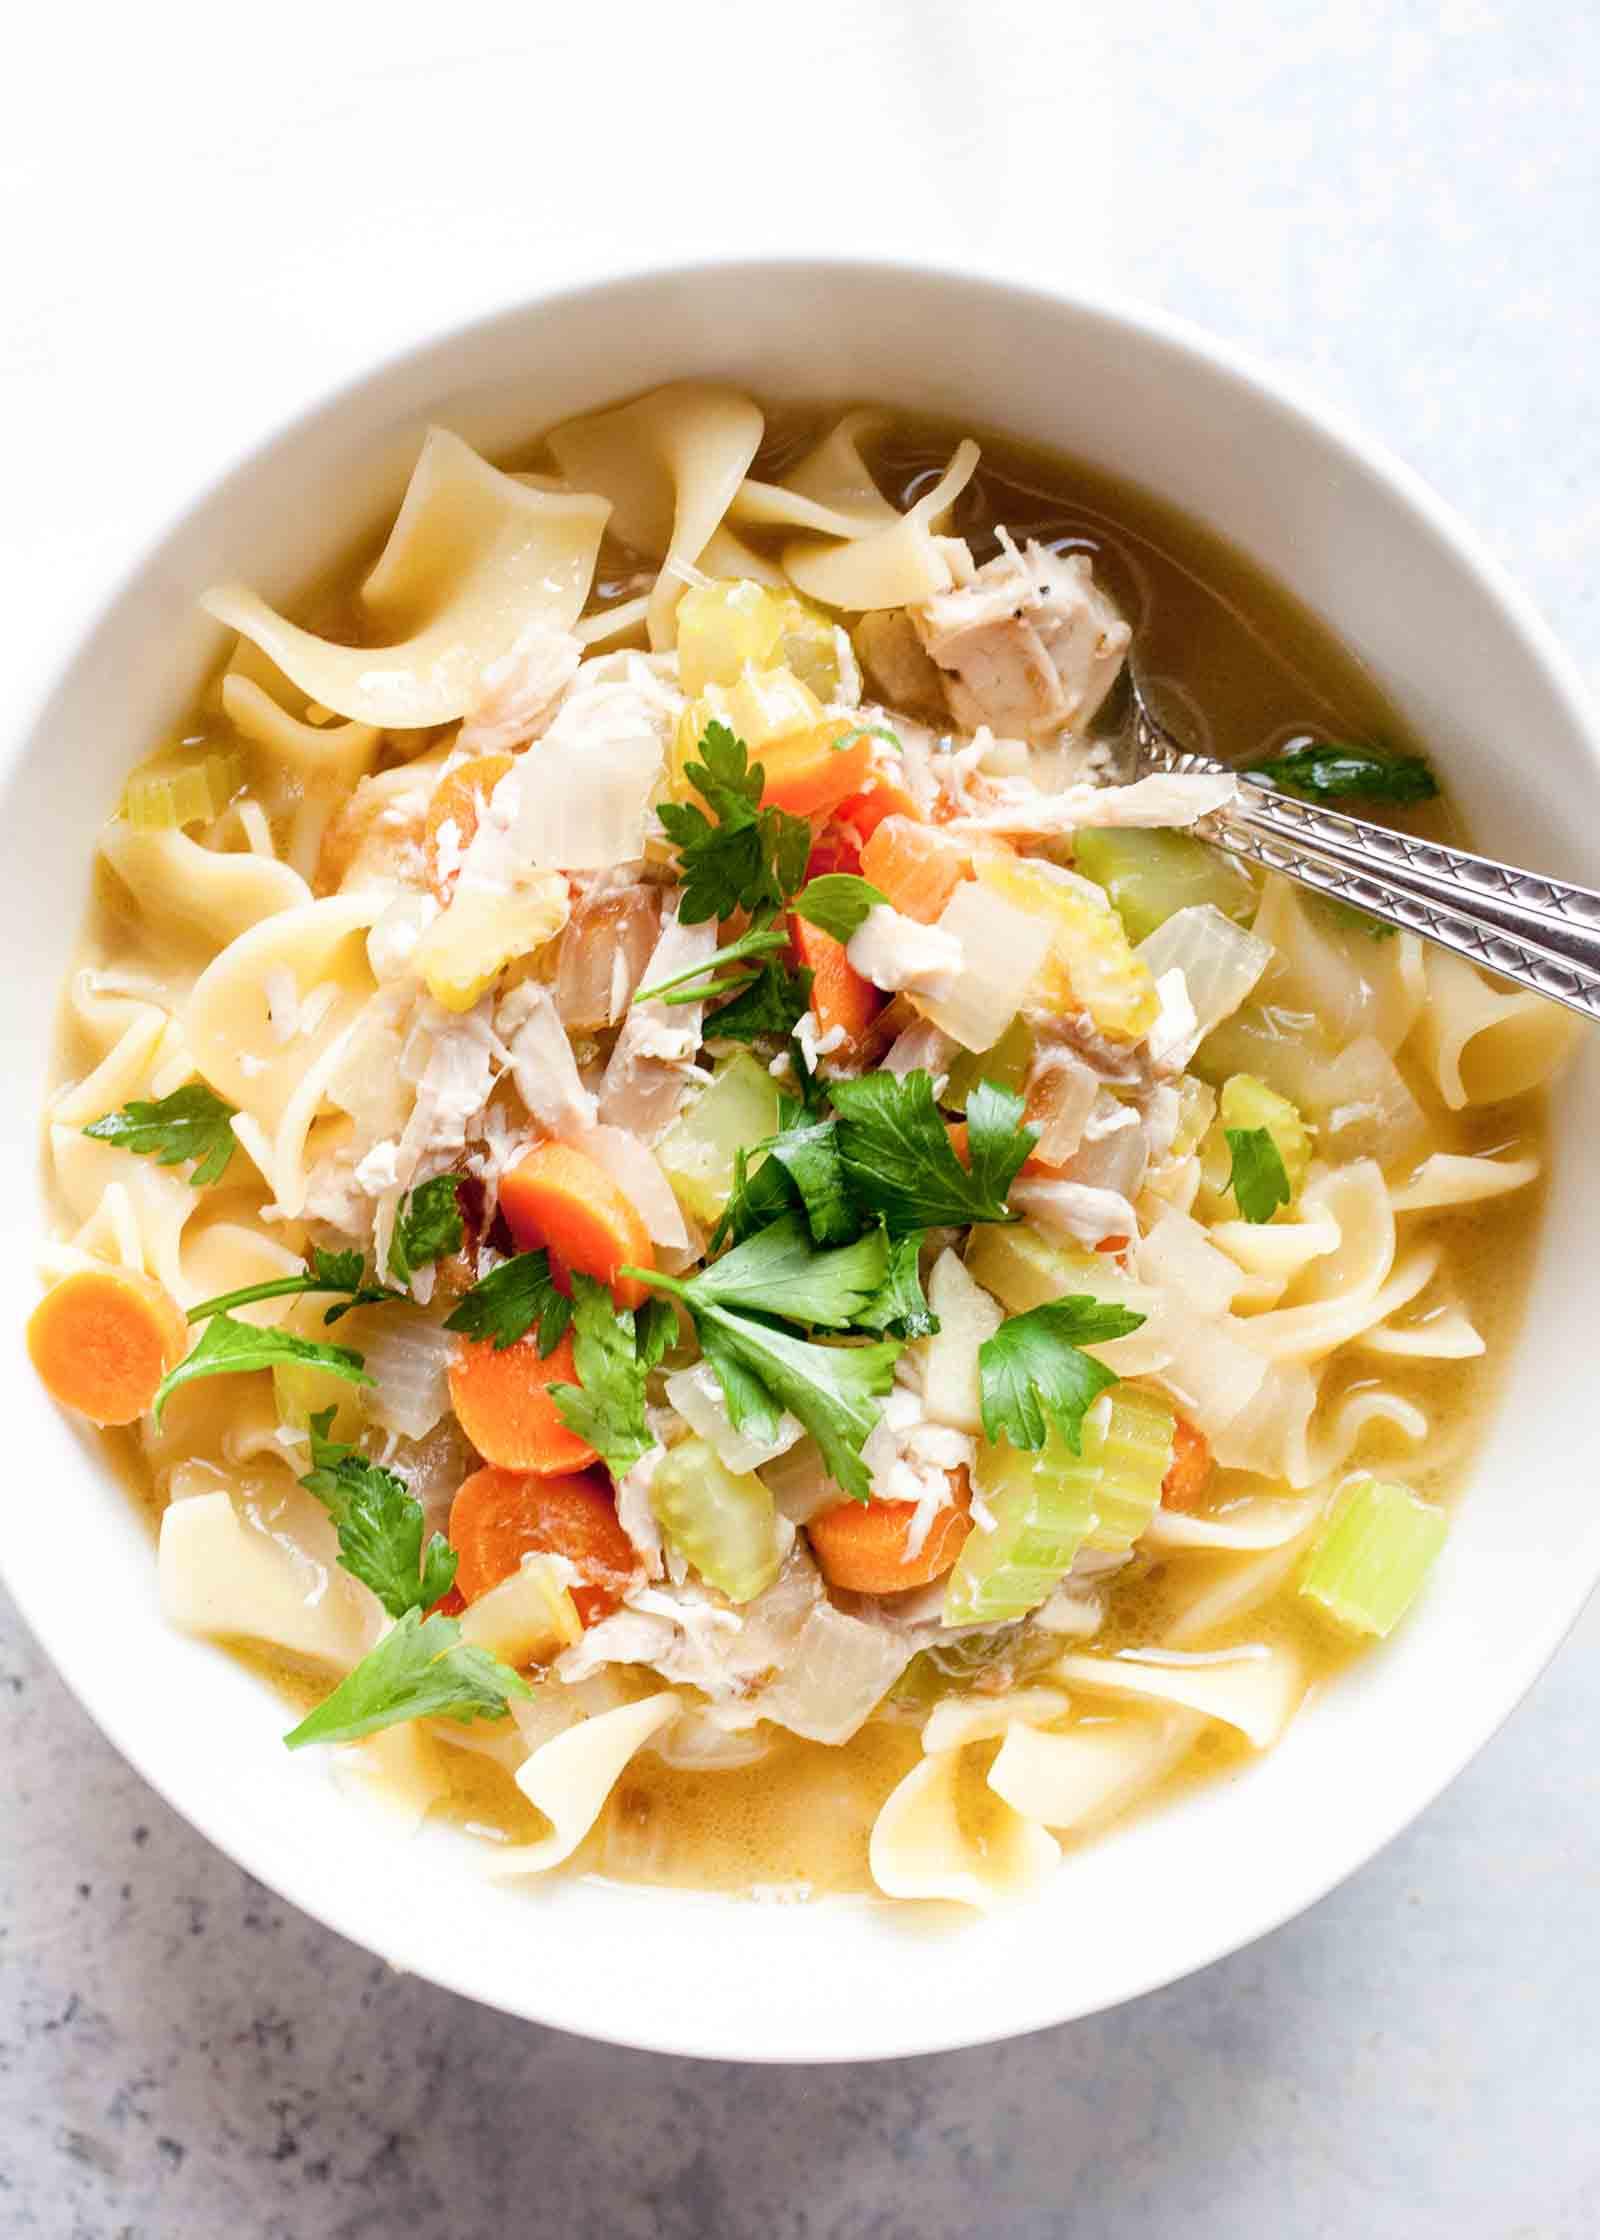 Free clipart printables for chicken n noodle dinner jpg black and white stock Rotisserie Chicken Noodle Soup jpg black and white stock